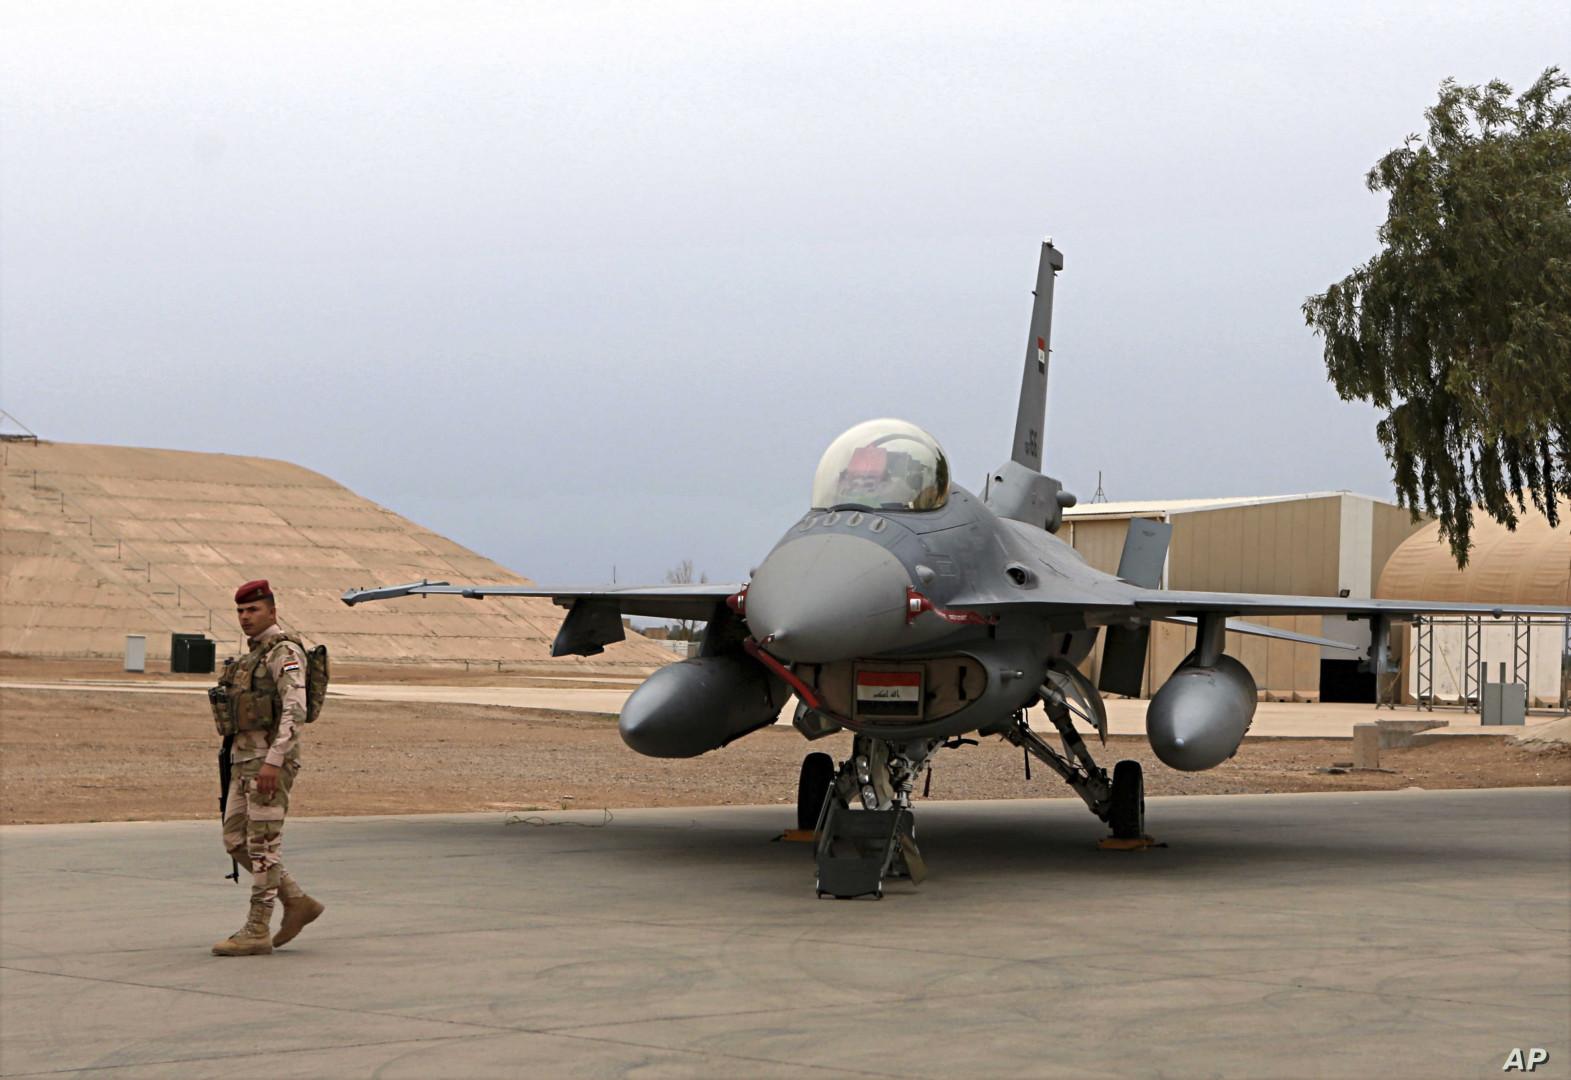 Three rockets land in Balad airbase north of Baghdad